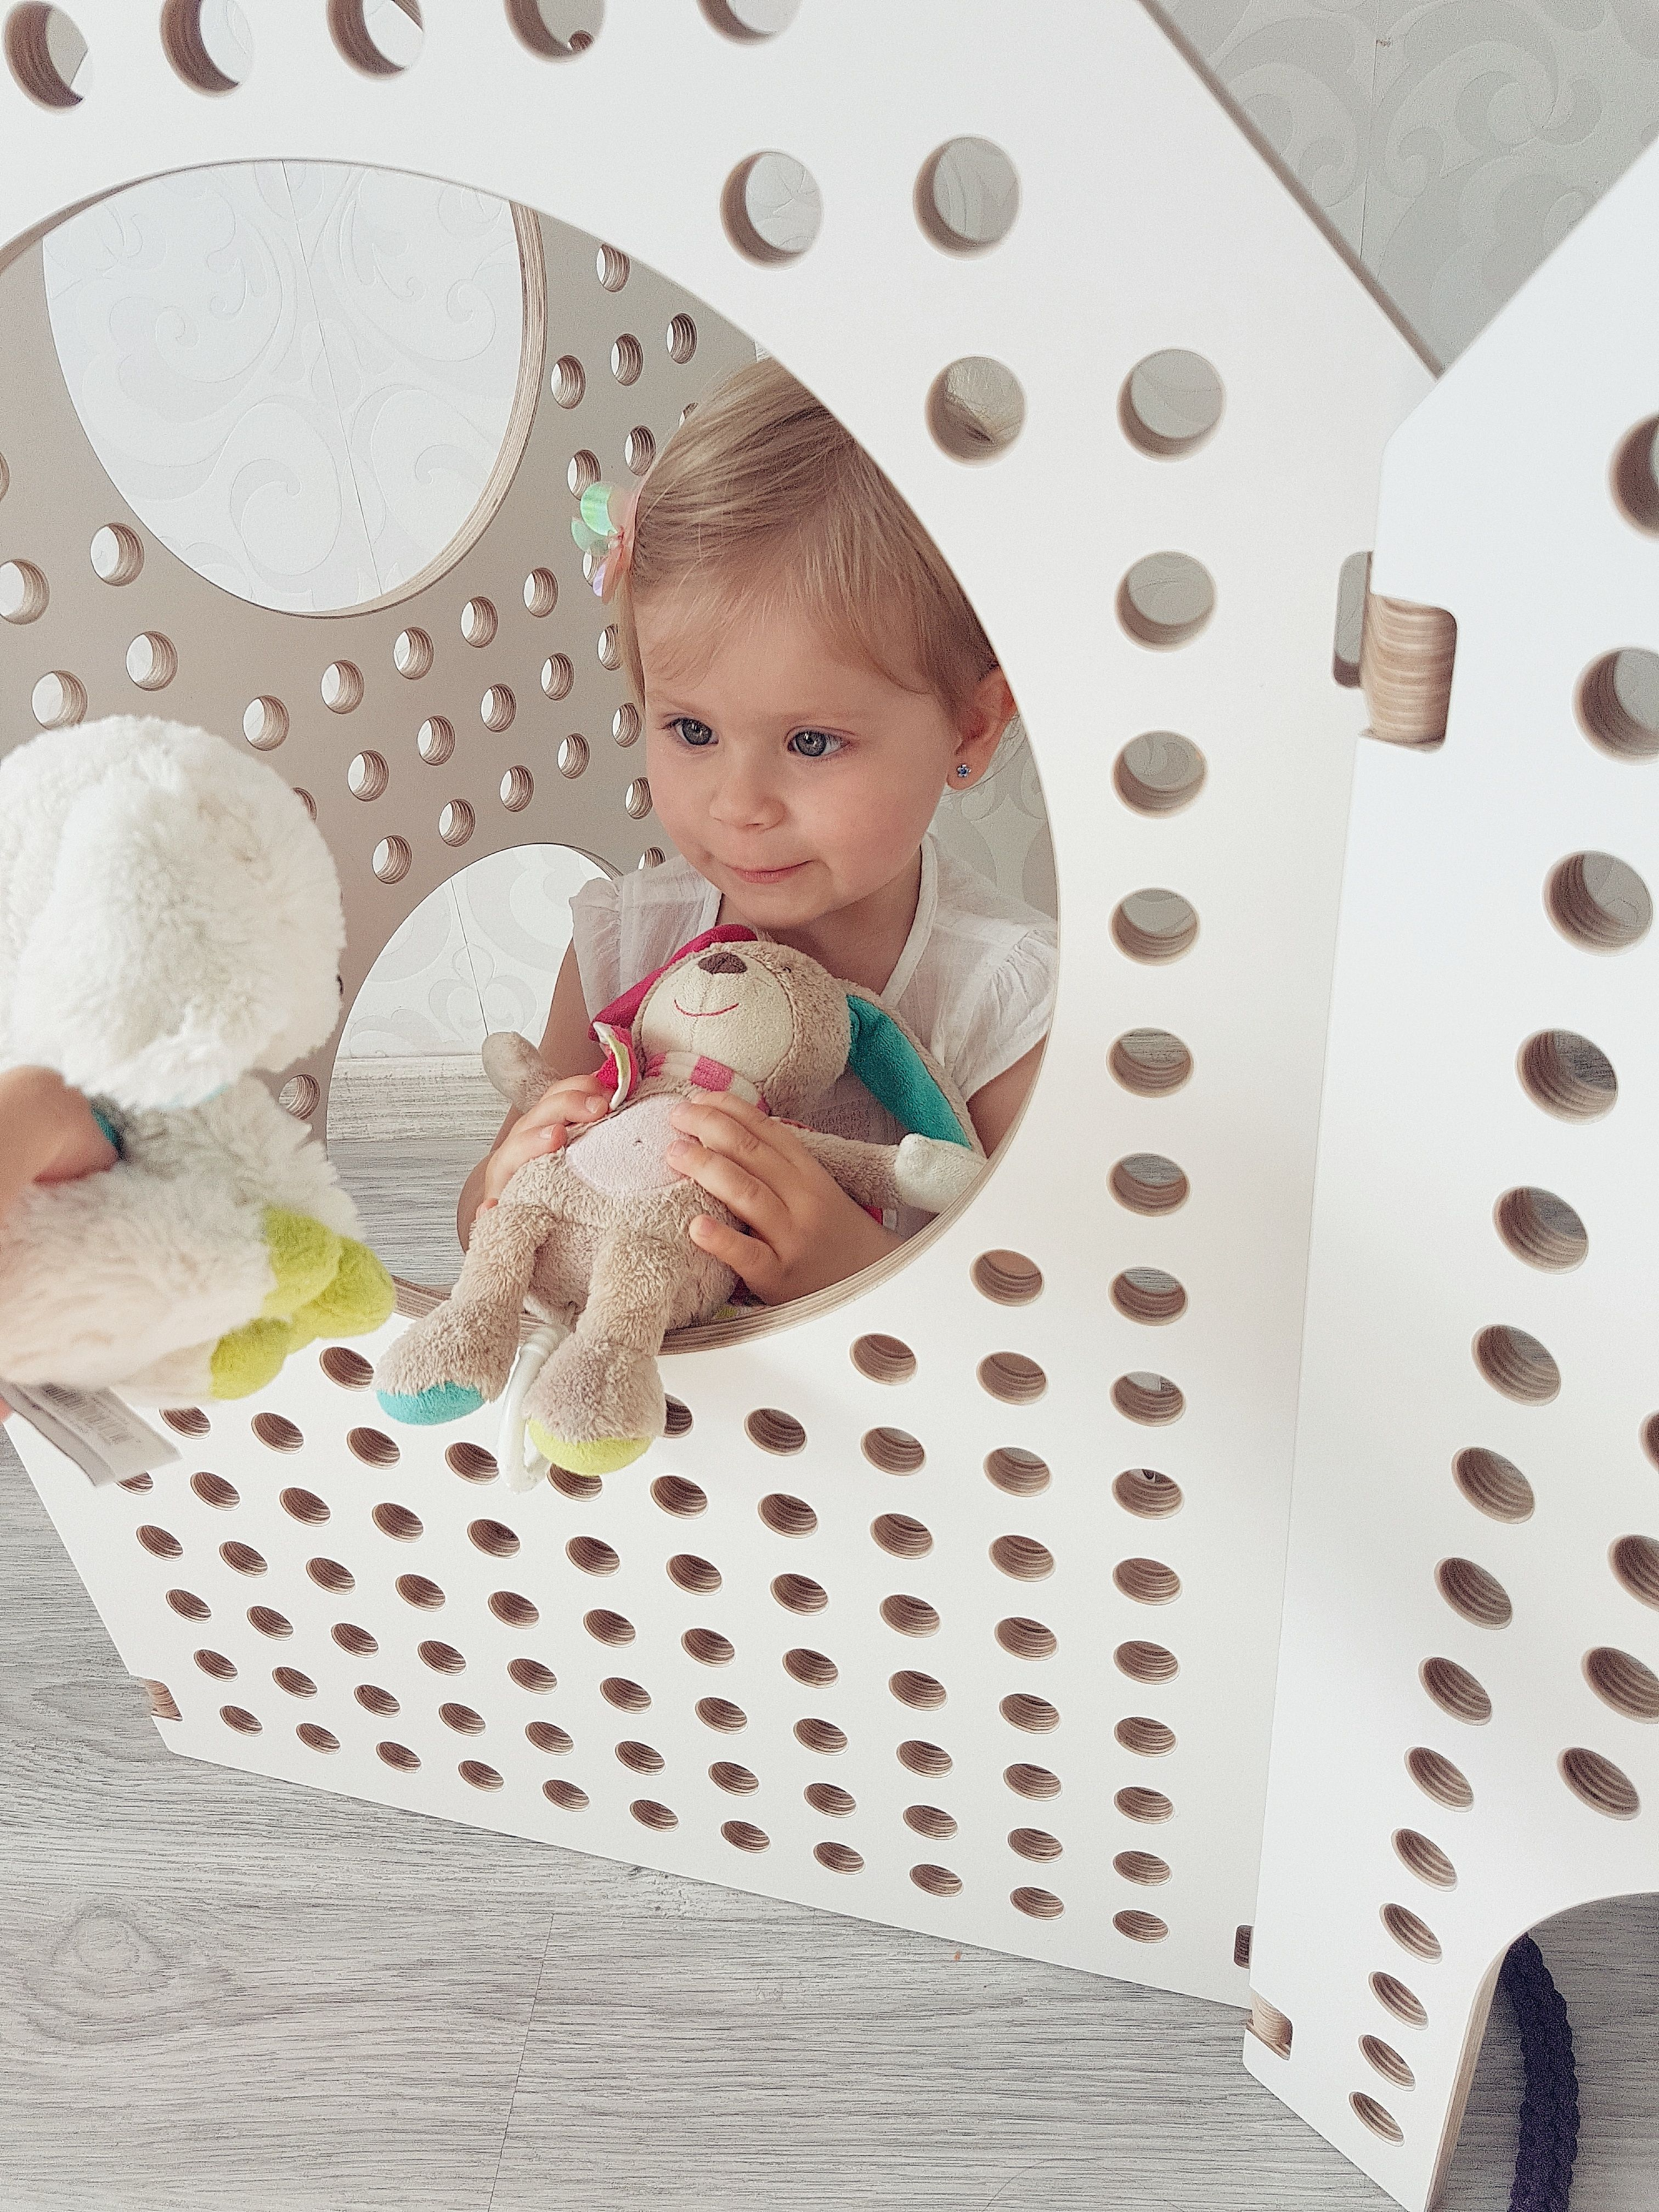 Sensory Play Space Divider | Playroom design | Sensory play, Space